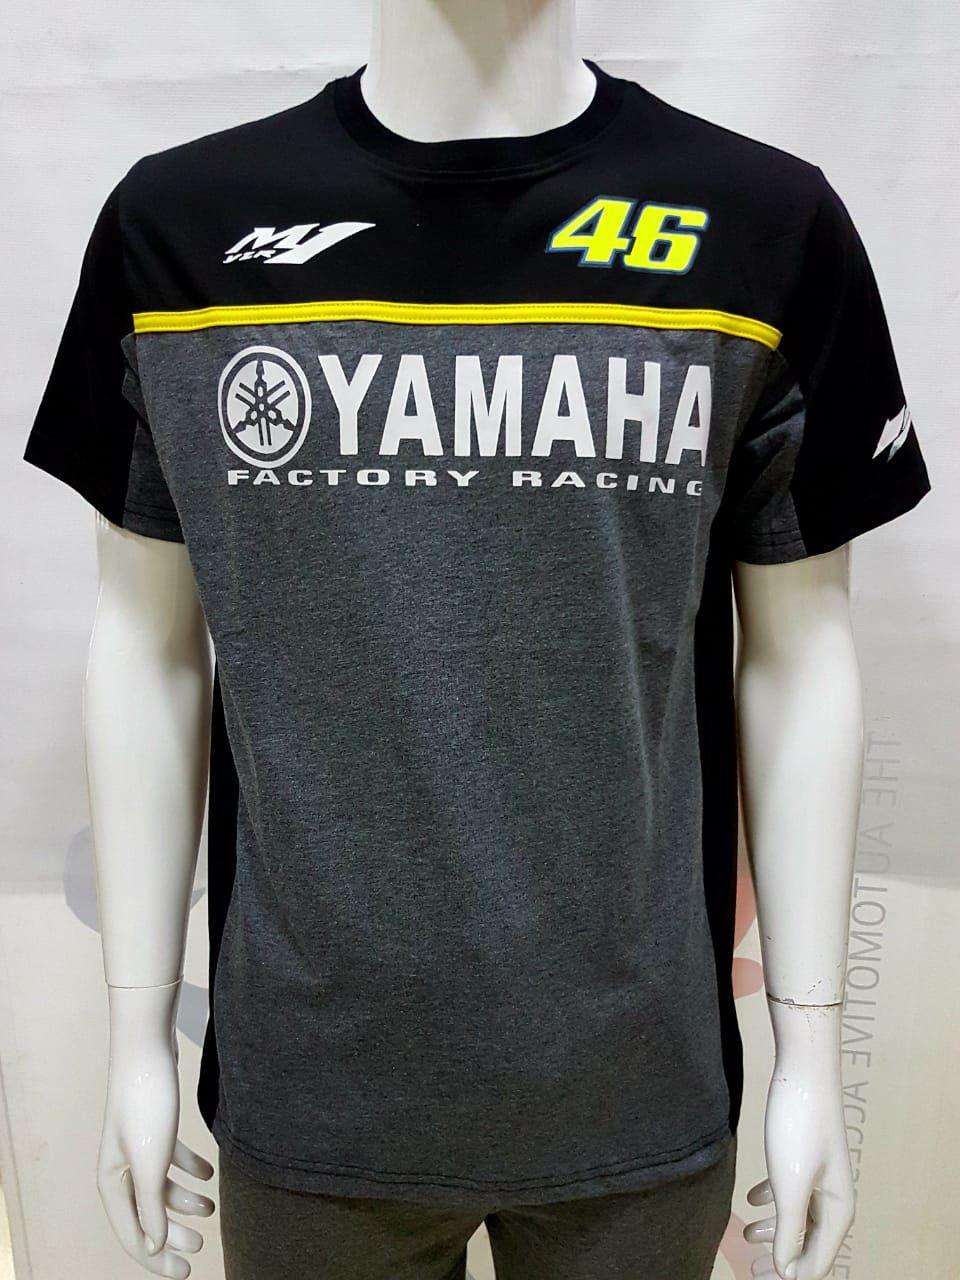 Yamaha M1 YZR 46 Factory Racing Round Neck Tshirts